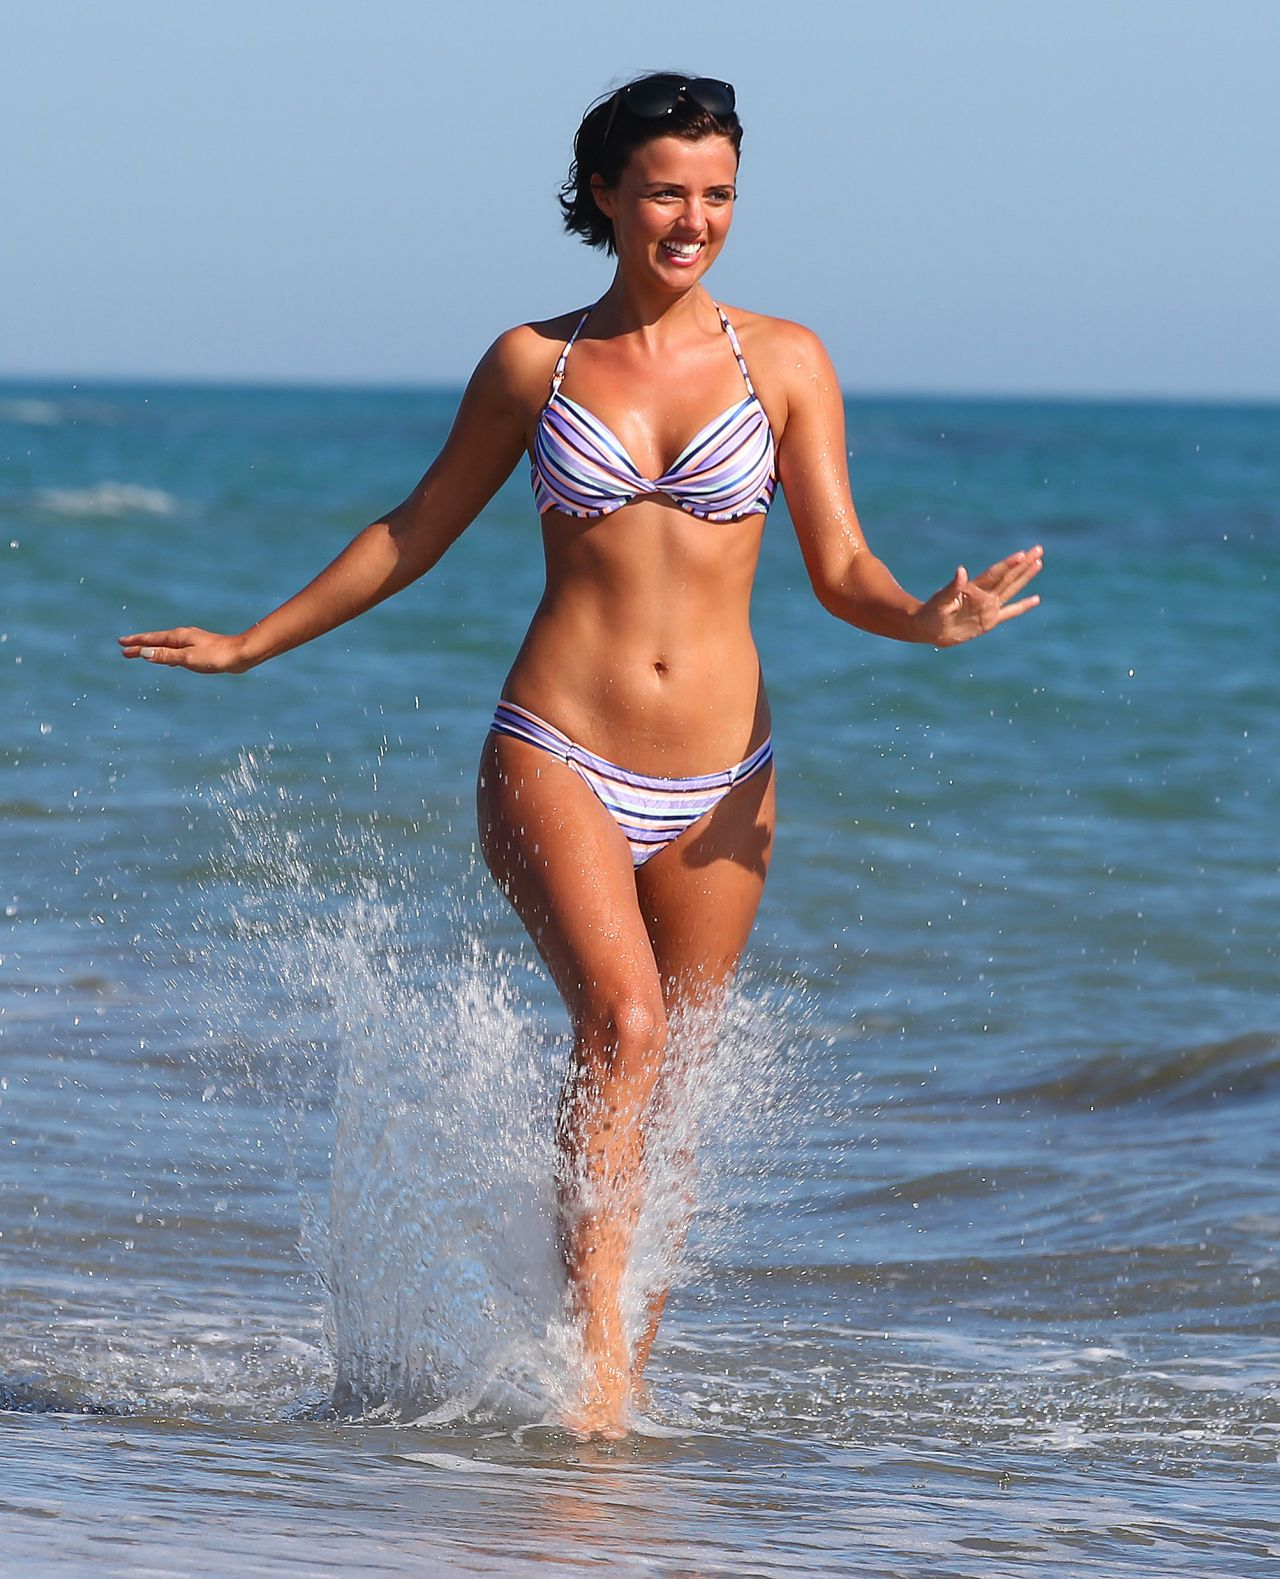 Lucy Mecklenburgh Bikini Photos Beach In Italy June 2014